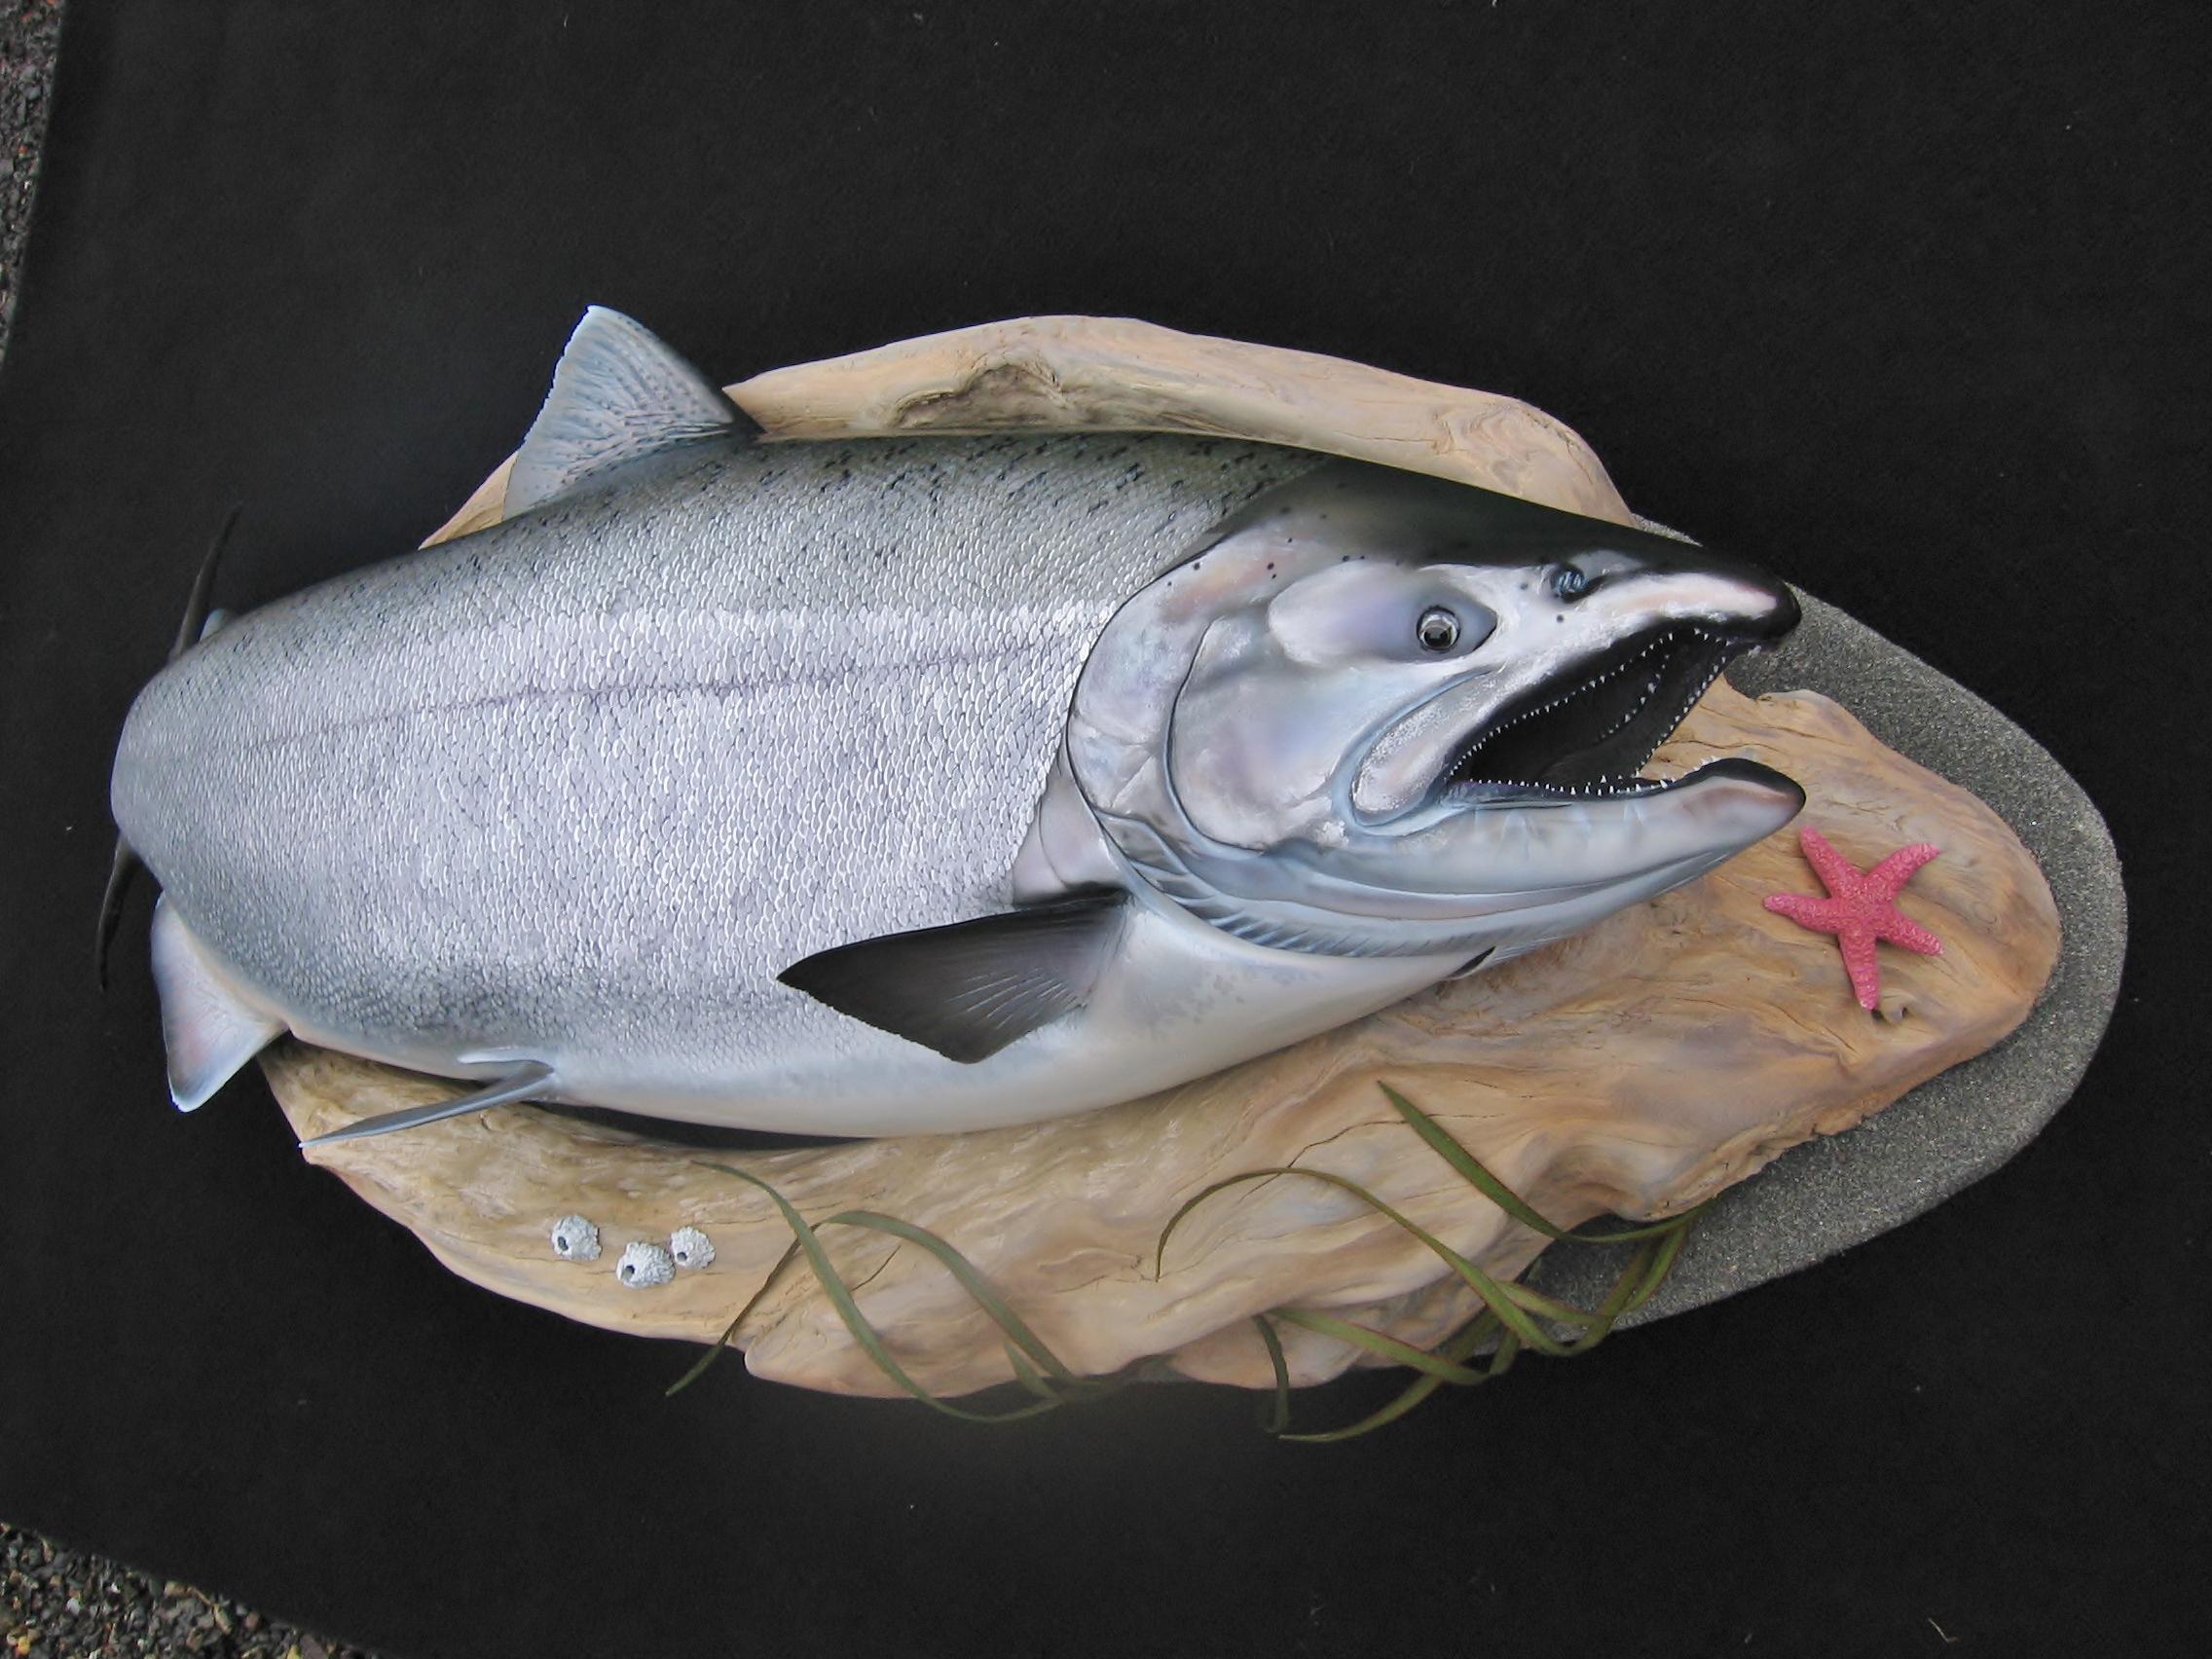 Chinook Salmon fish replica art sculpture by Luke Filmer of Blackwater